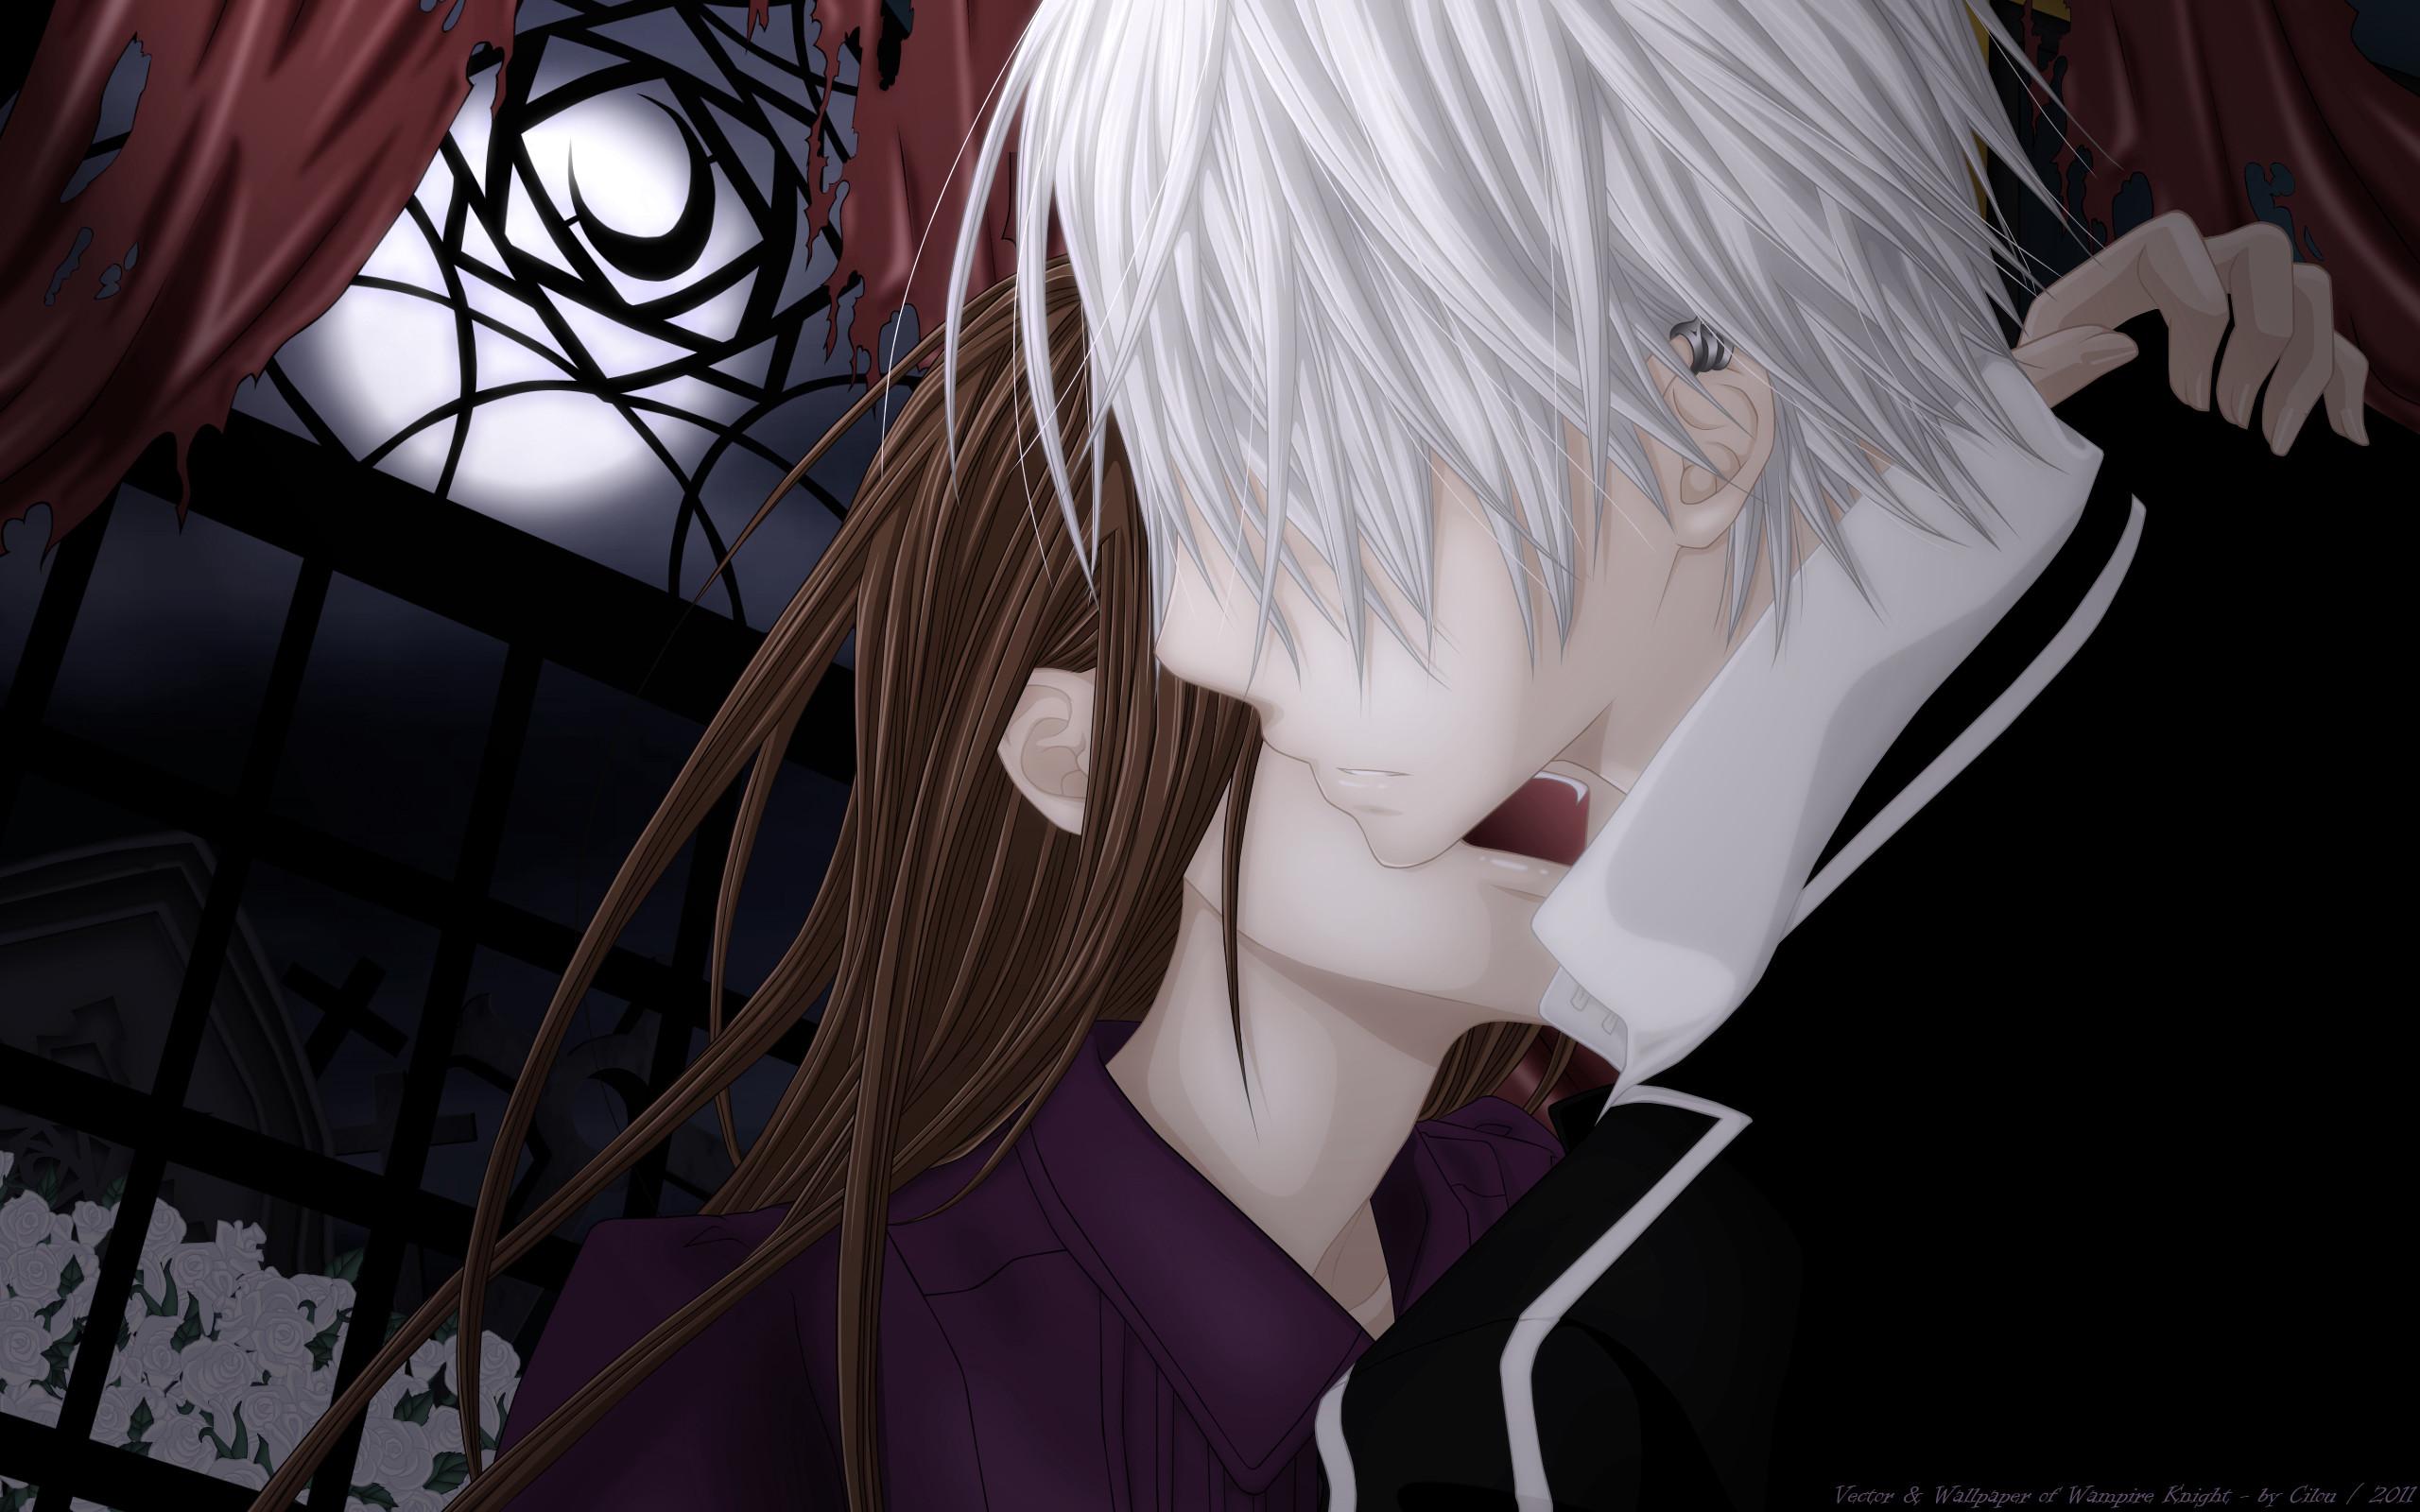 Tags: Anime, Vampire Knight, Kiryuu Zero, Yuki Cross, Wallpaper,